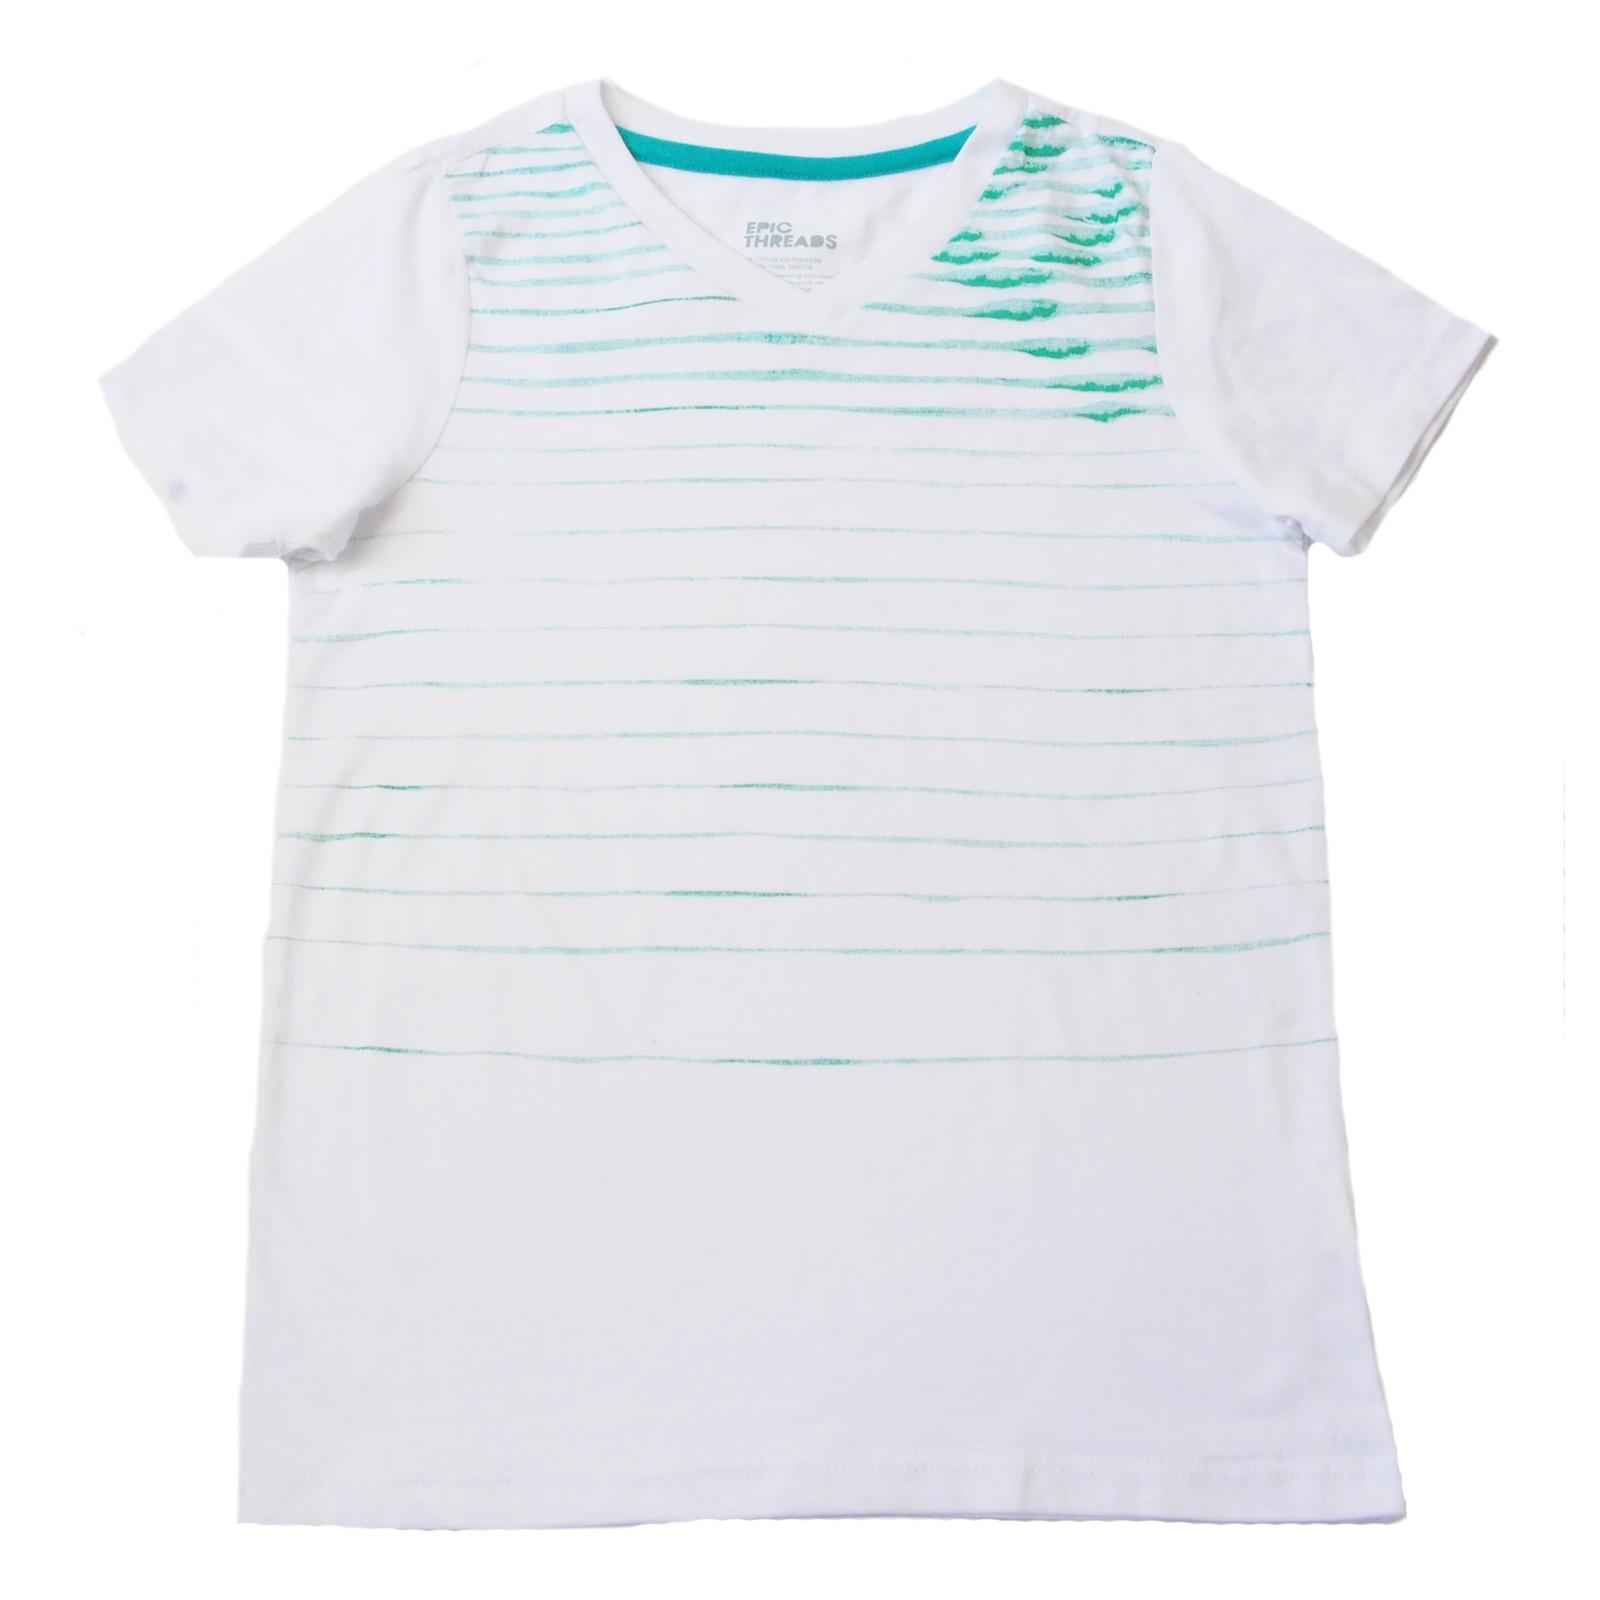 Детская футболка Epic Threads.